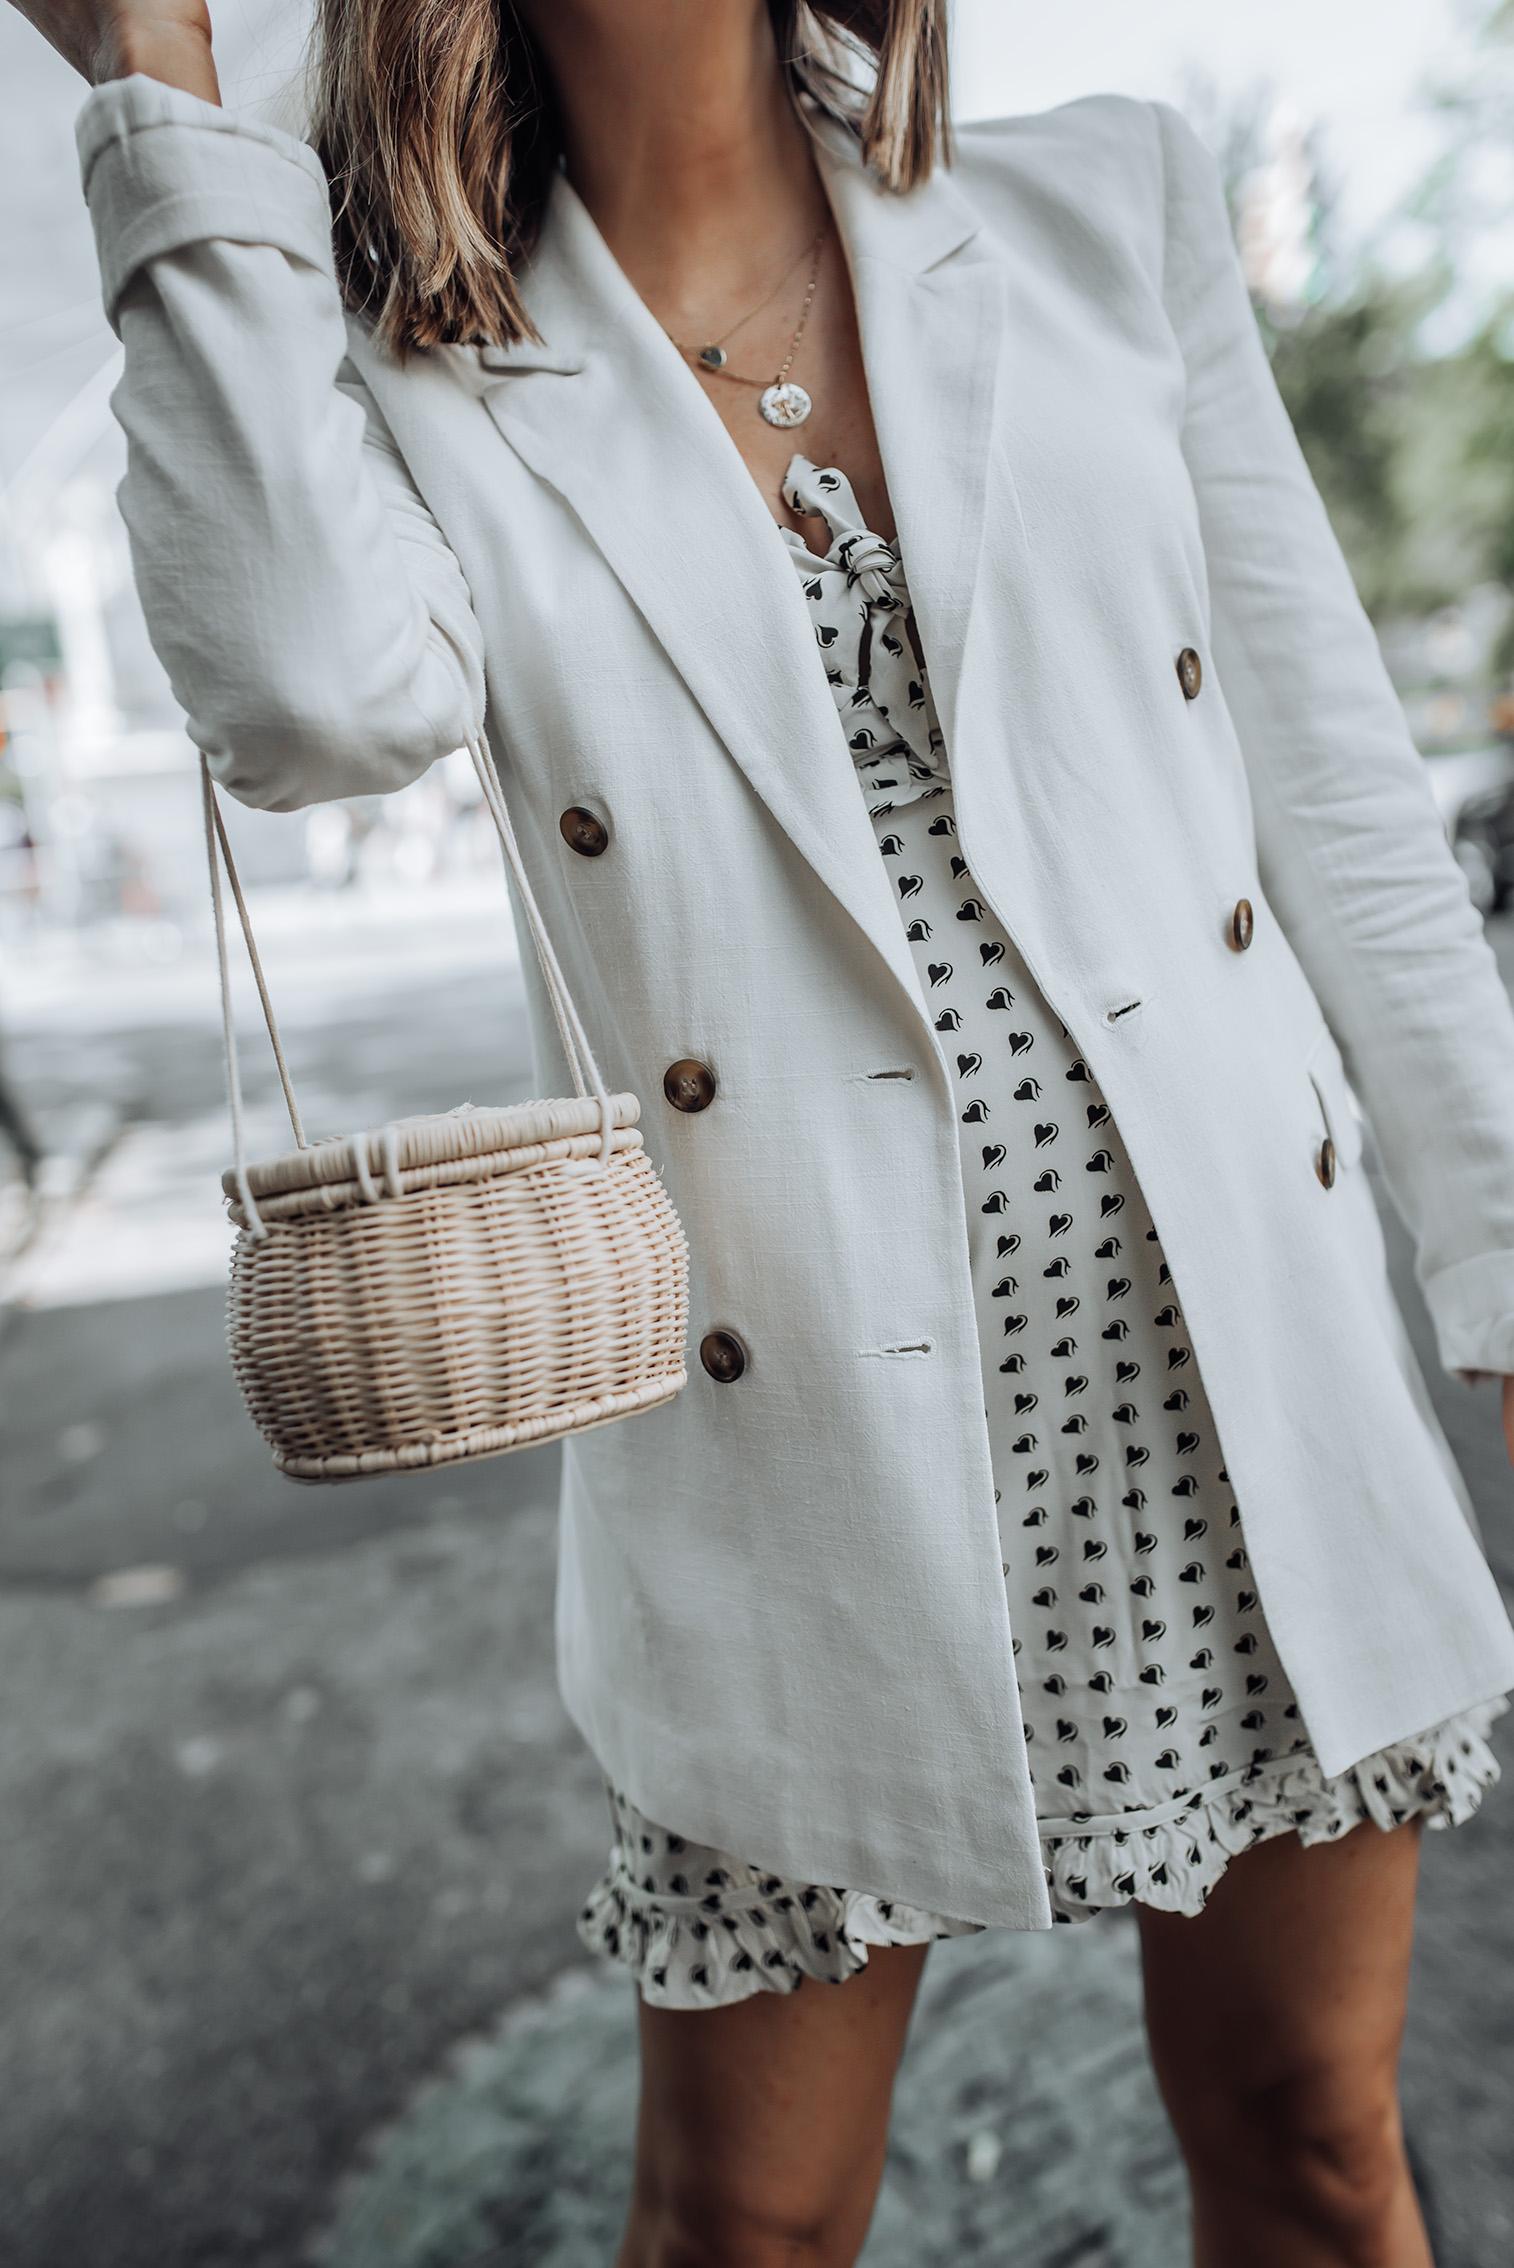 For Love & Lemons Sweetheart Mini Dress | Linen Blazer | ZARA Handbag | Leather Booties #liketkit #blazeroutfits #zara #streetstyle